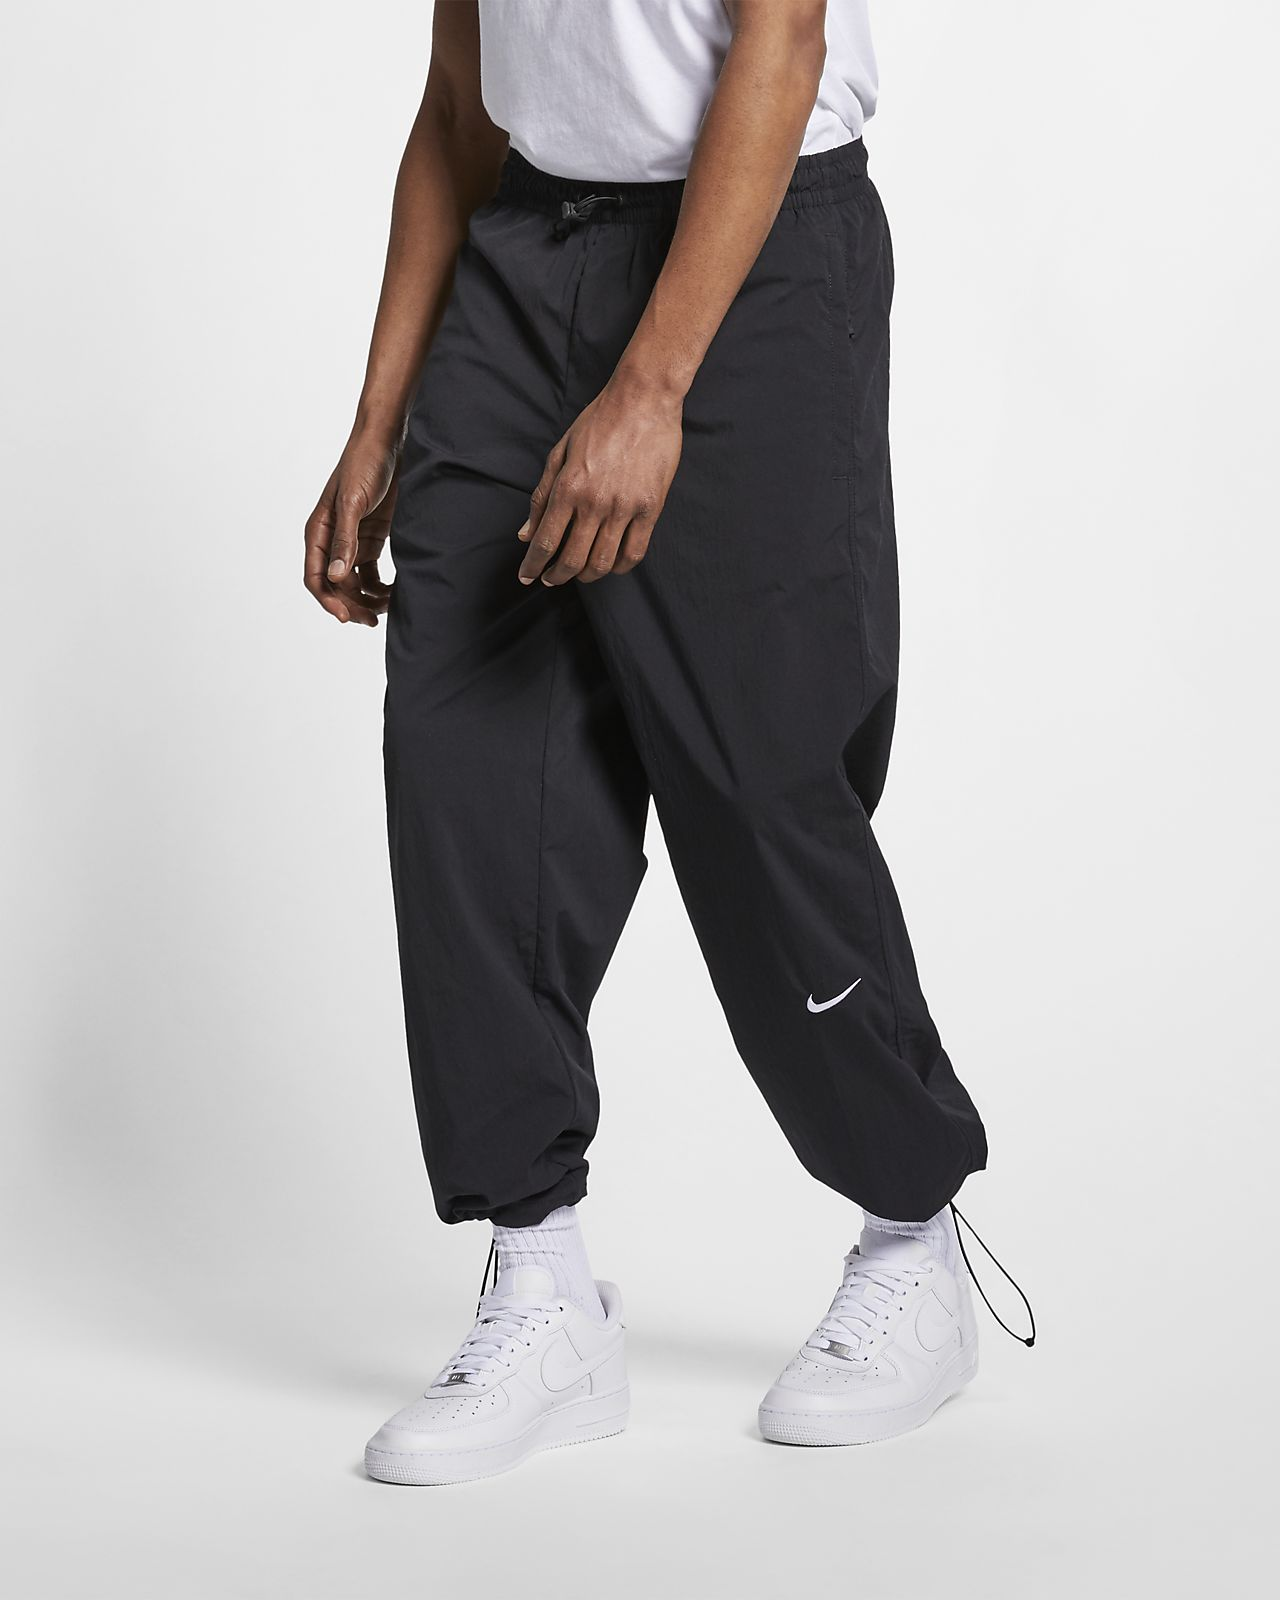 NikeLab Collection Herenbroek